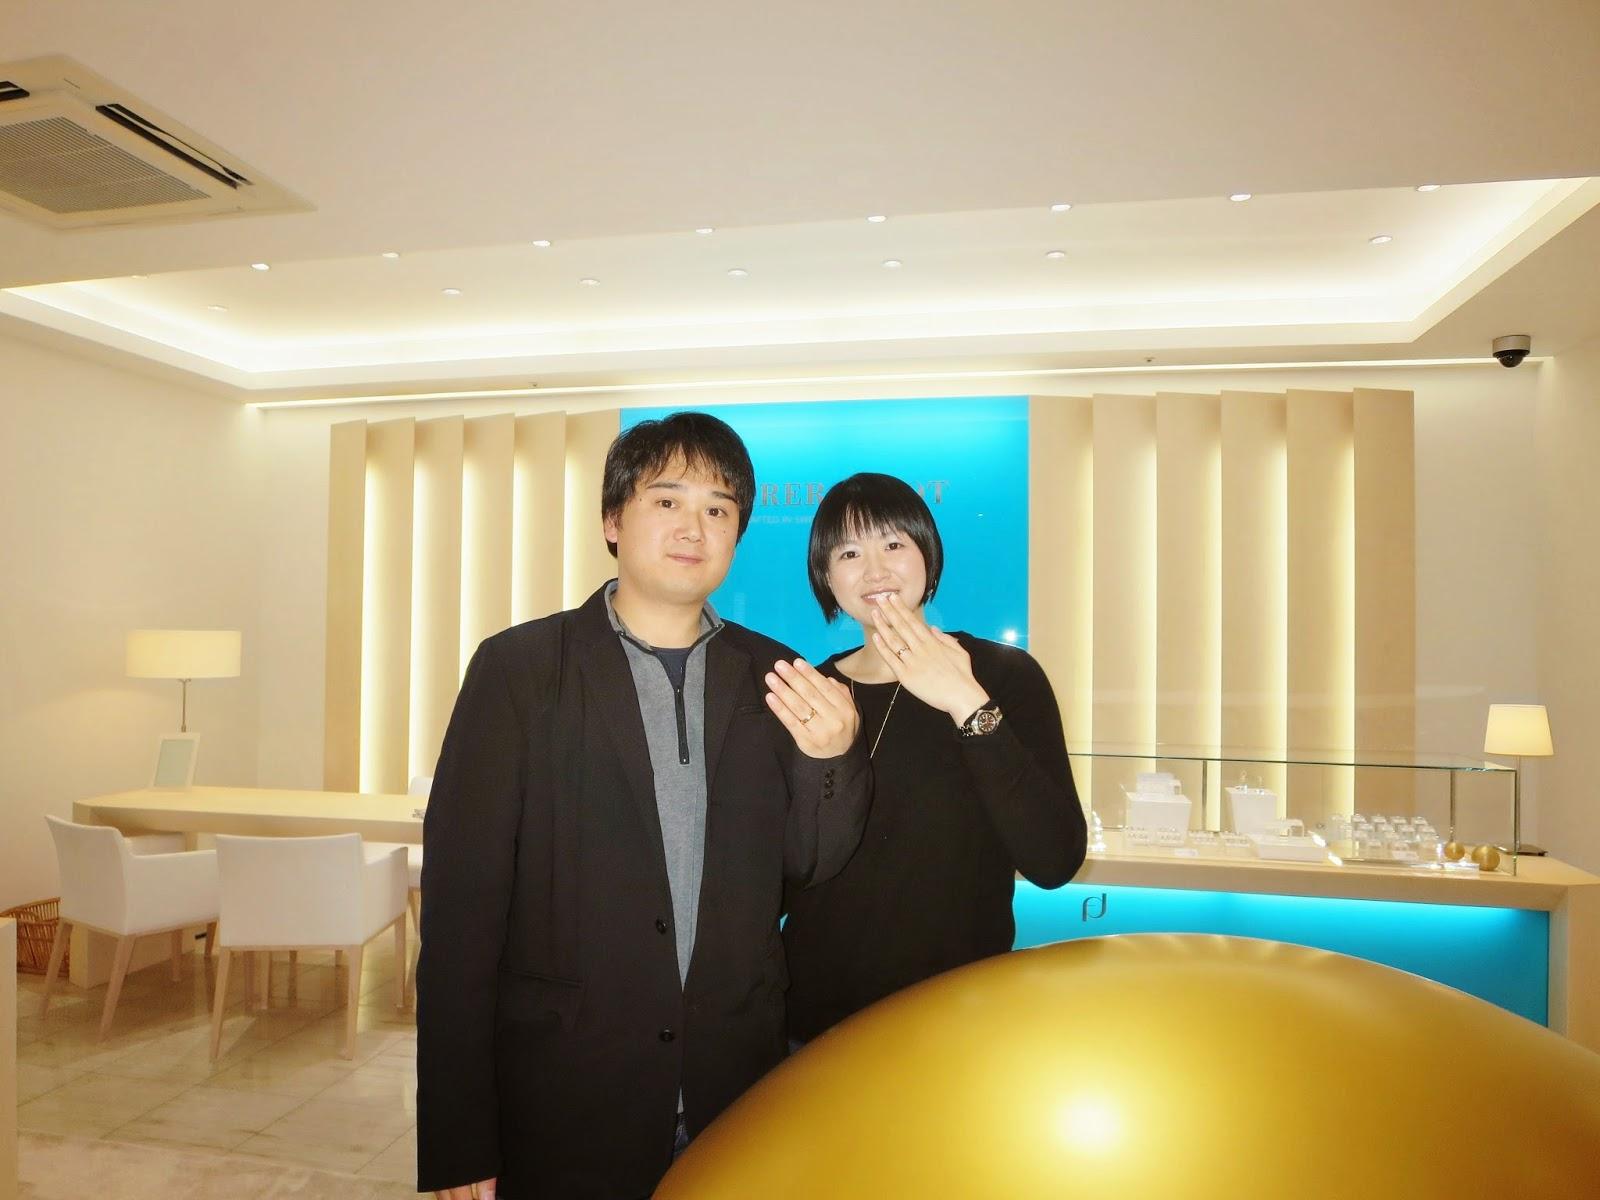 FURRER JACOT フラージャコー名古屋 鍛造 特別 結婚指輪 スイスメイド ゴールド ダイヤモンド